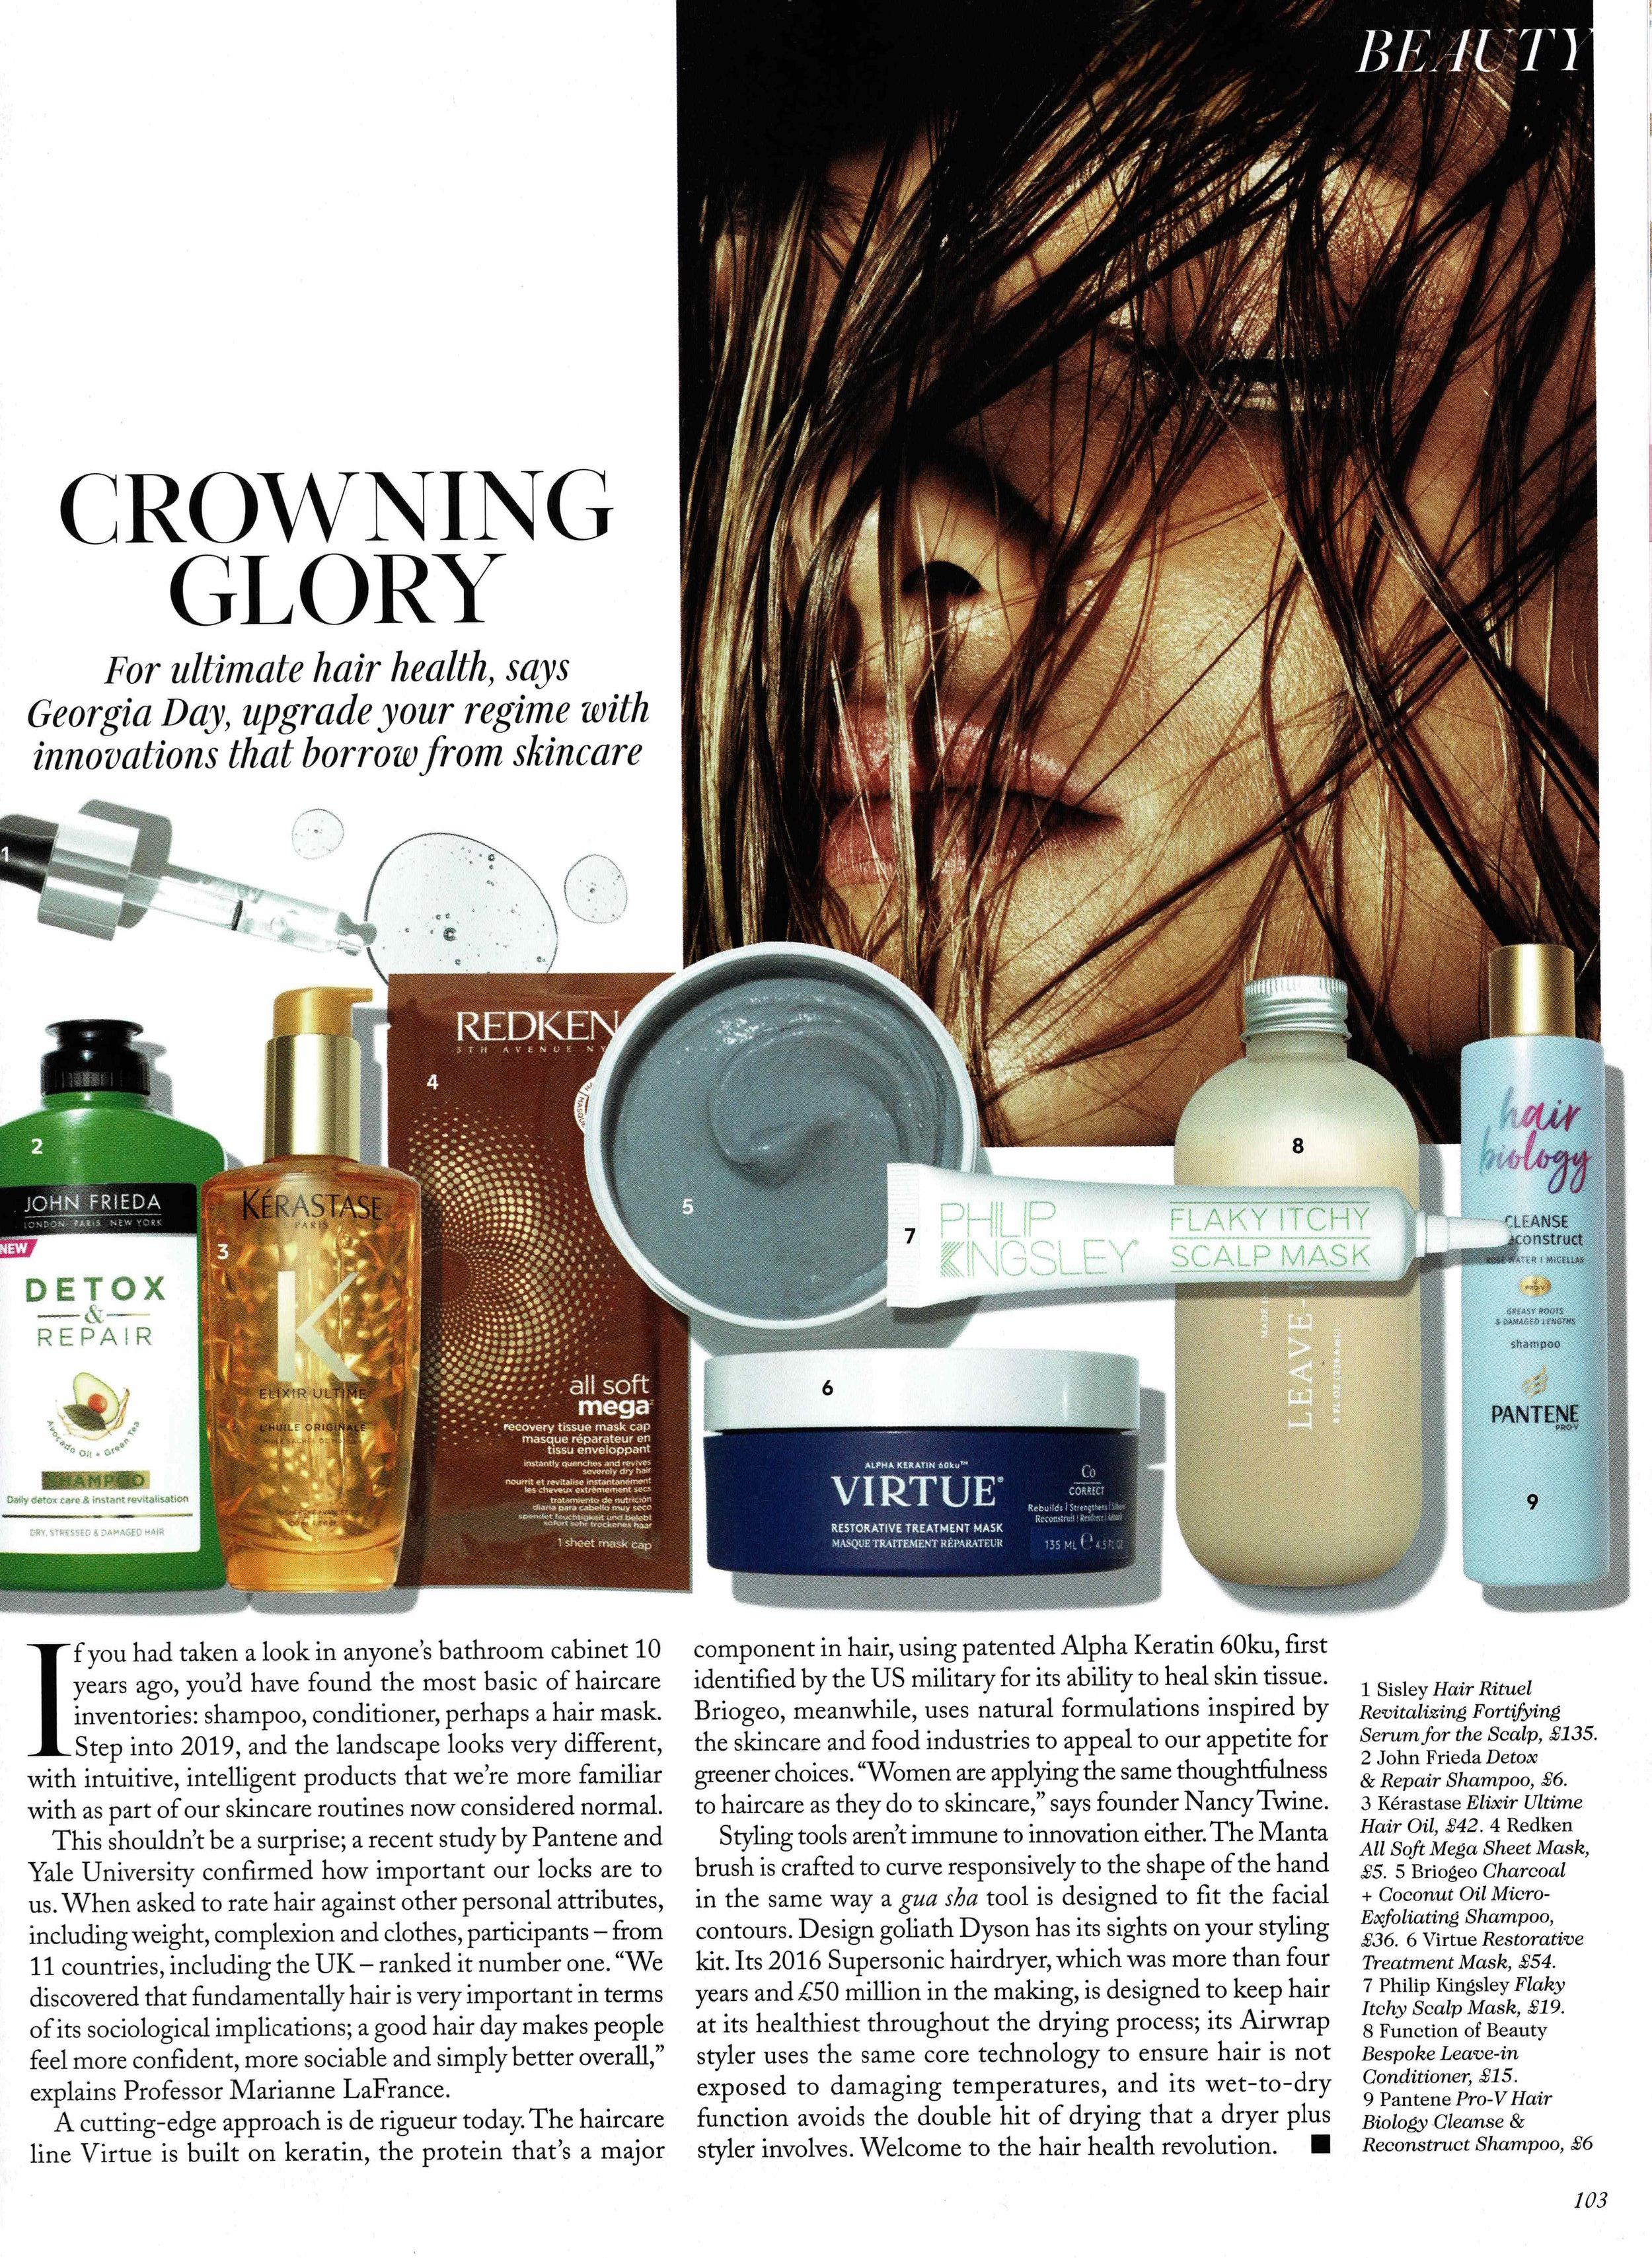 Vogue, June (Charcoal & Coconut Oil Micro-Exfoliating Shampoo, Nancy Quotes) 2.jpeg